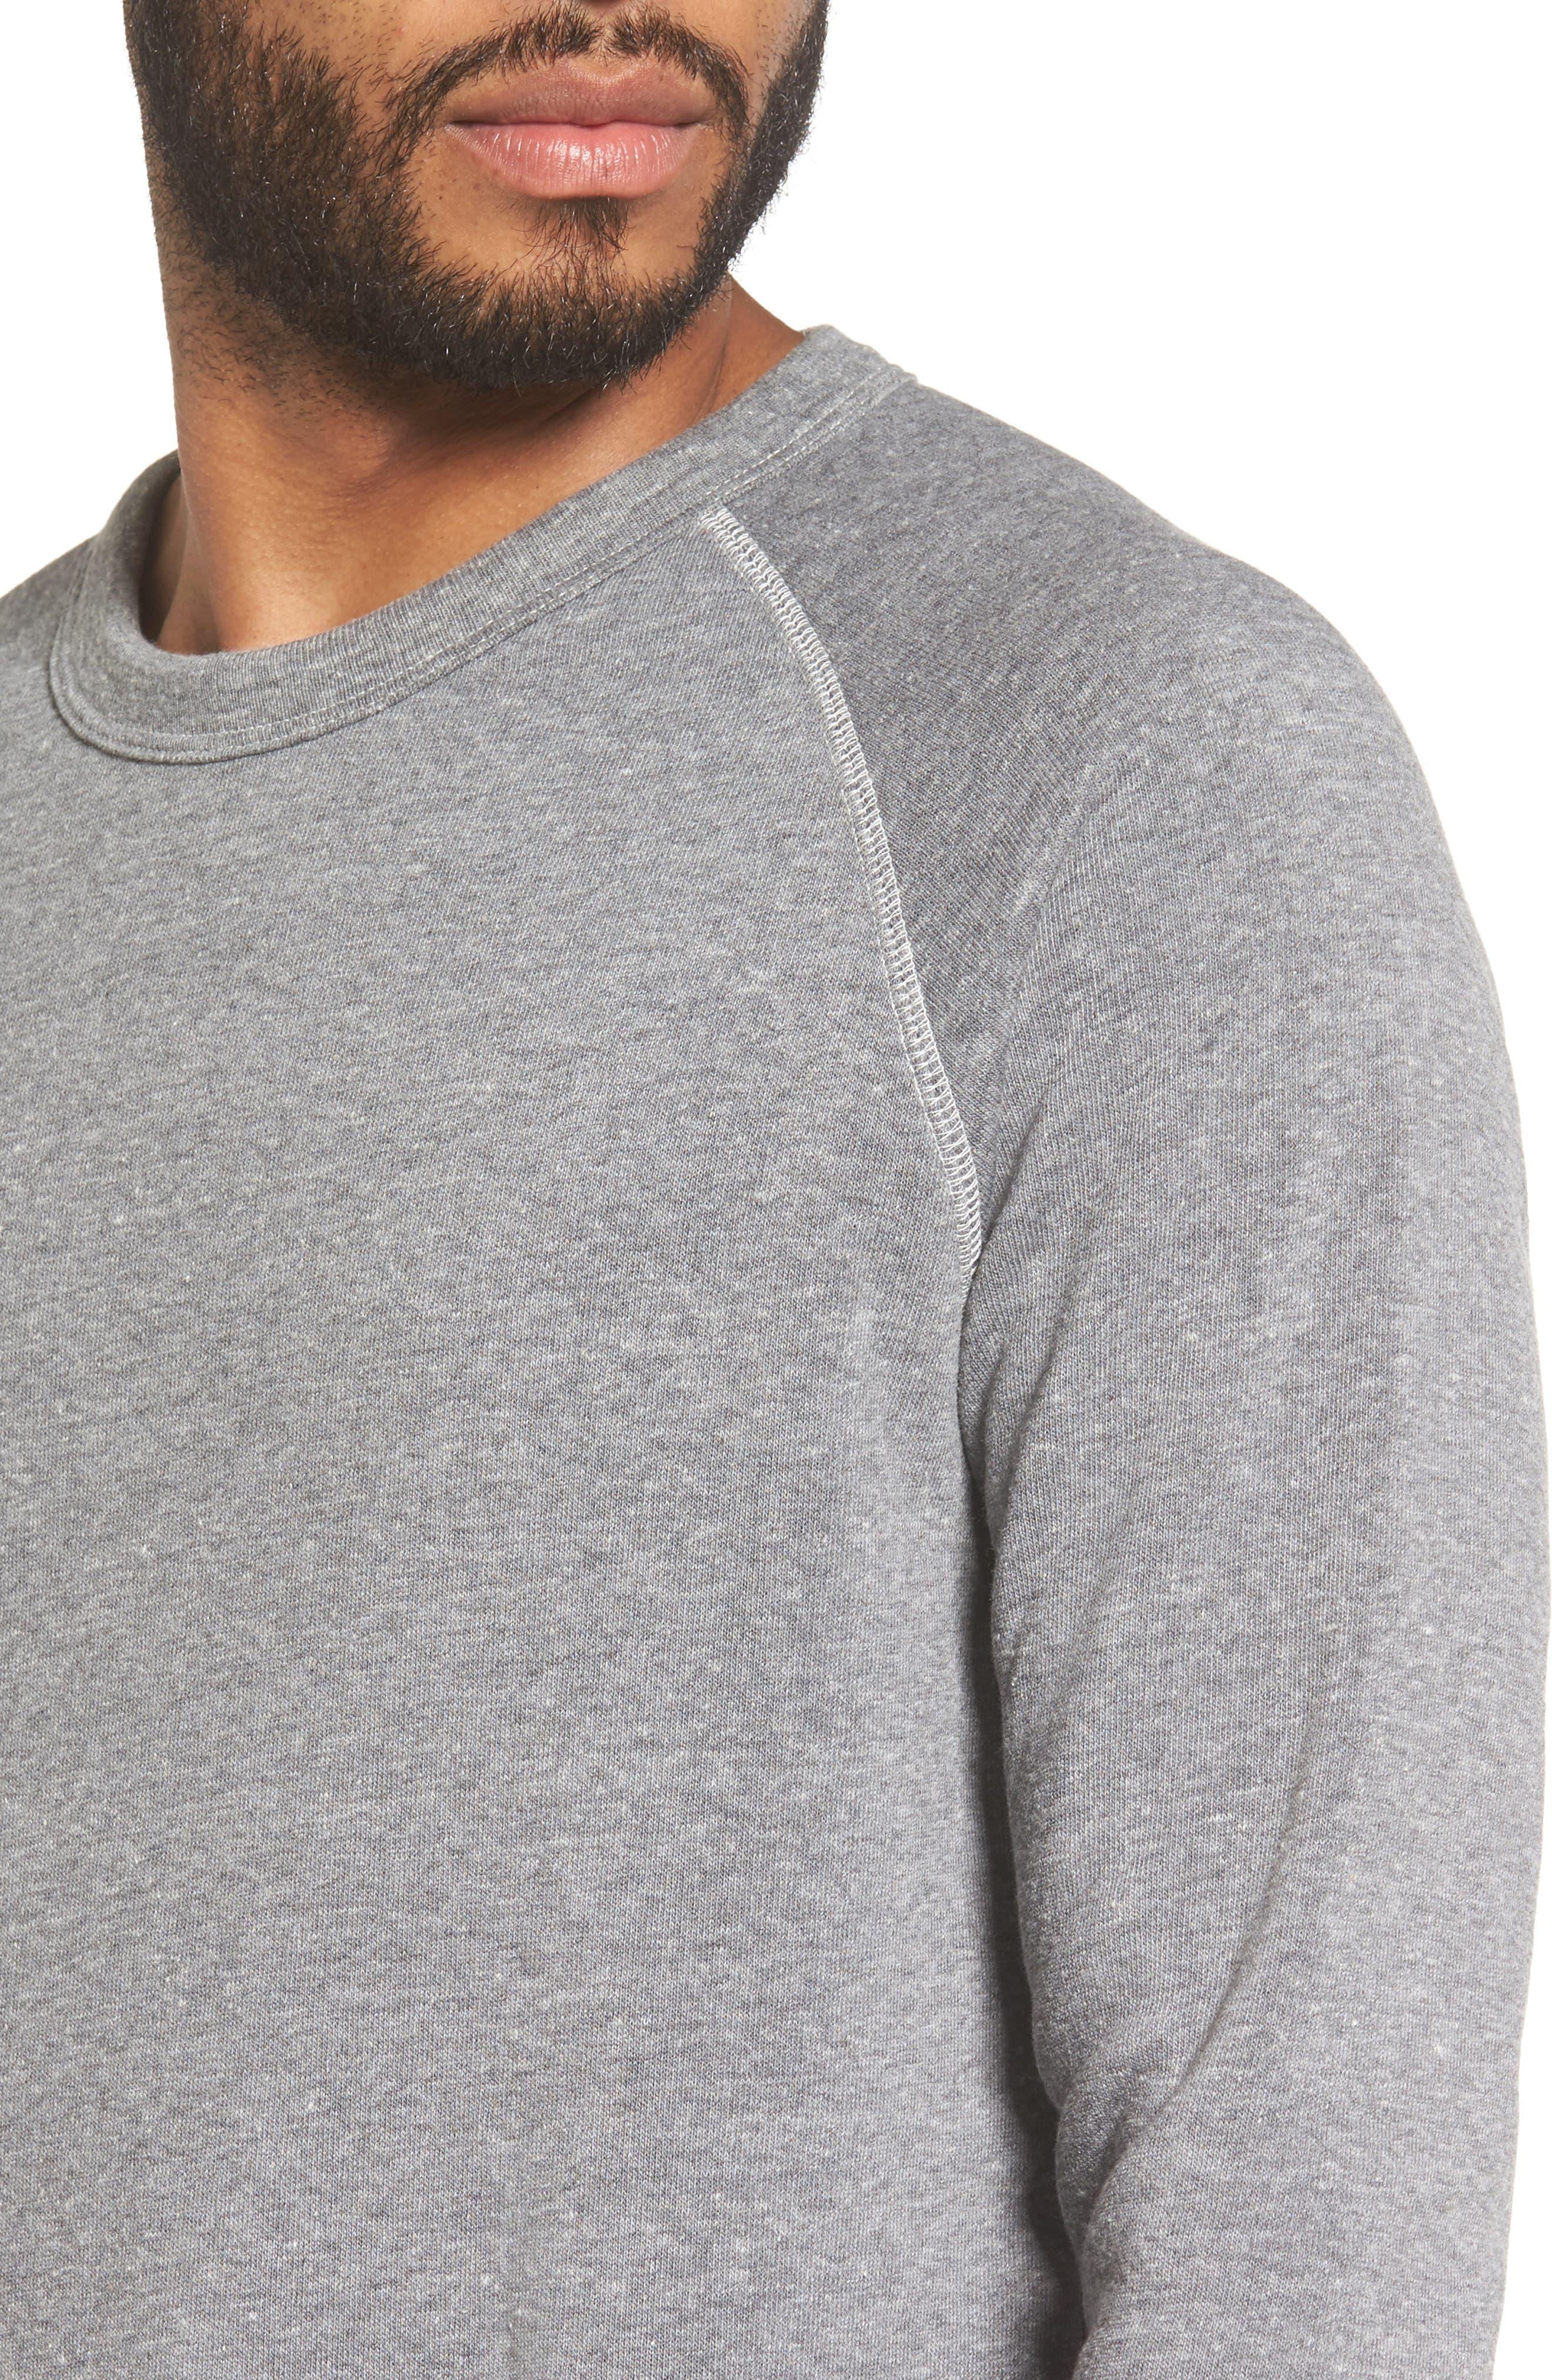 'The Champ' Sweatshirt,                             Alternate thumbnail 52, color,